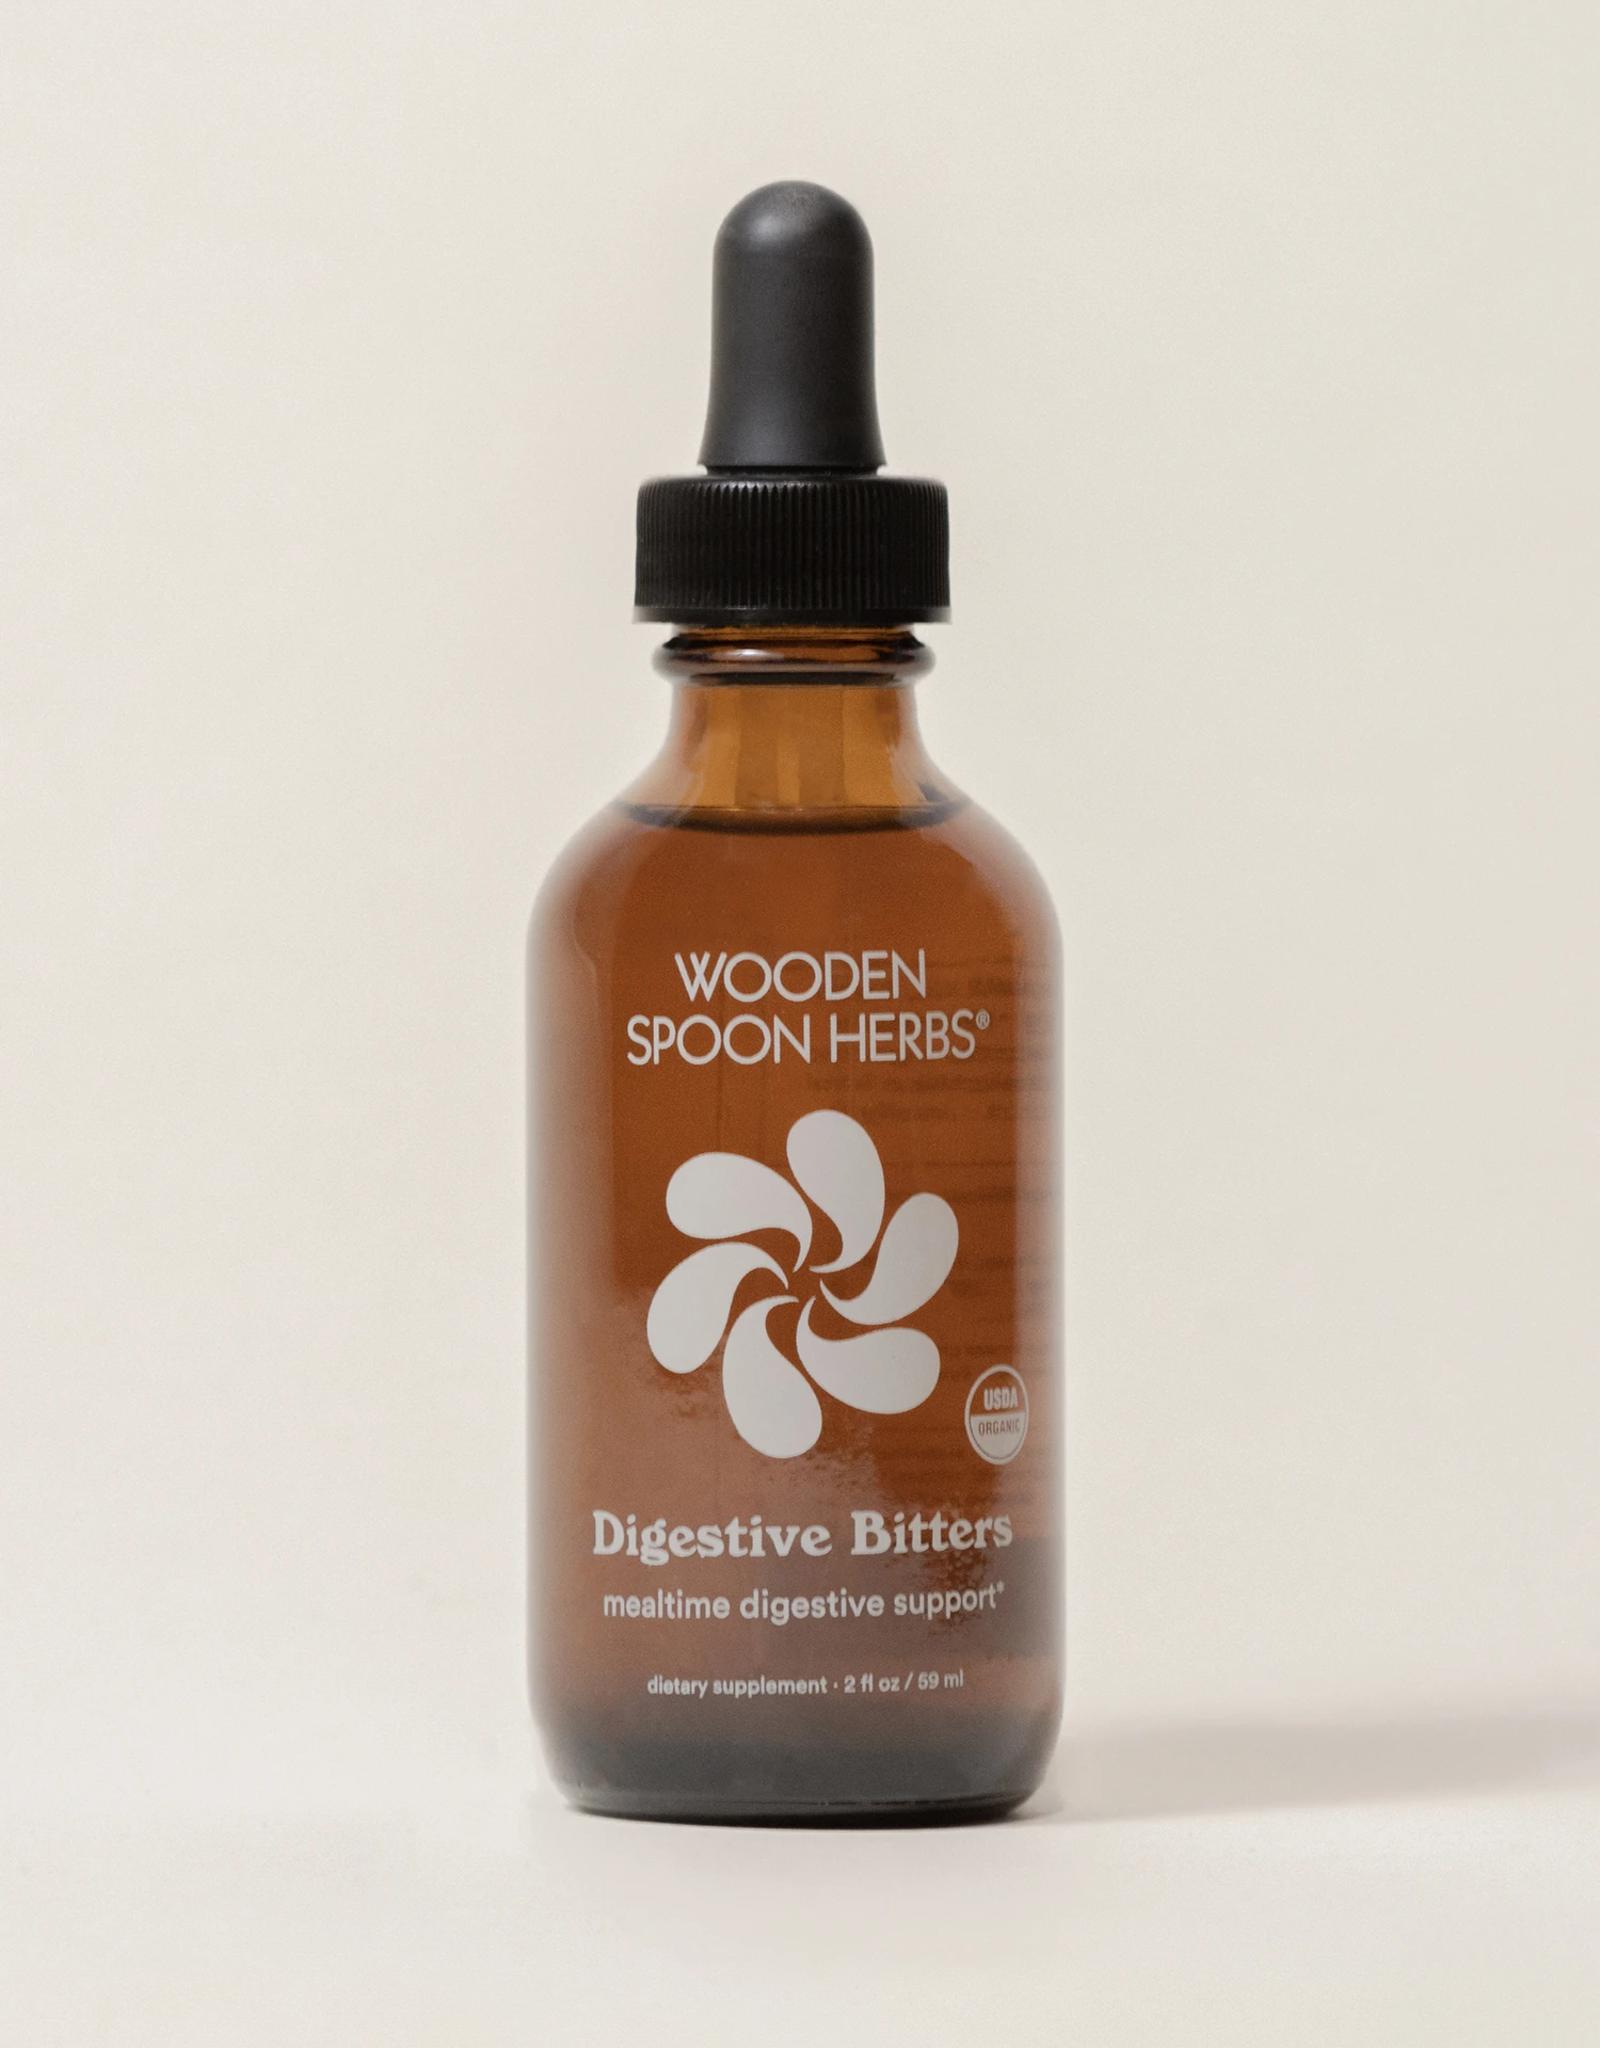 Wooden Spoon Herbs Digestive Bitters